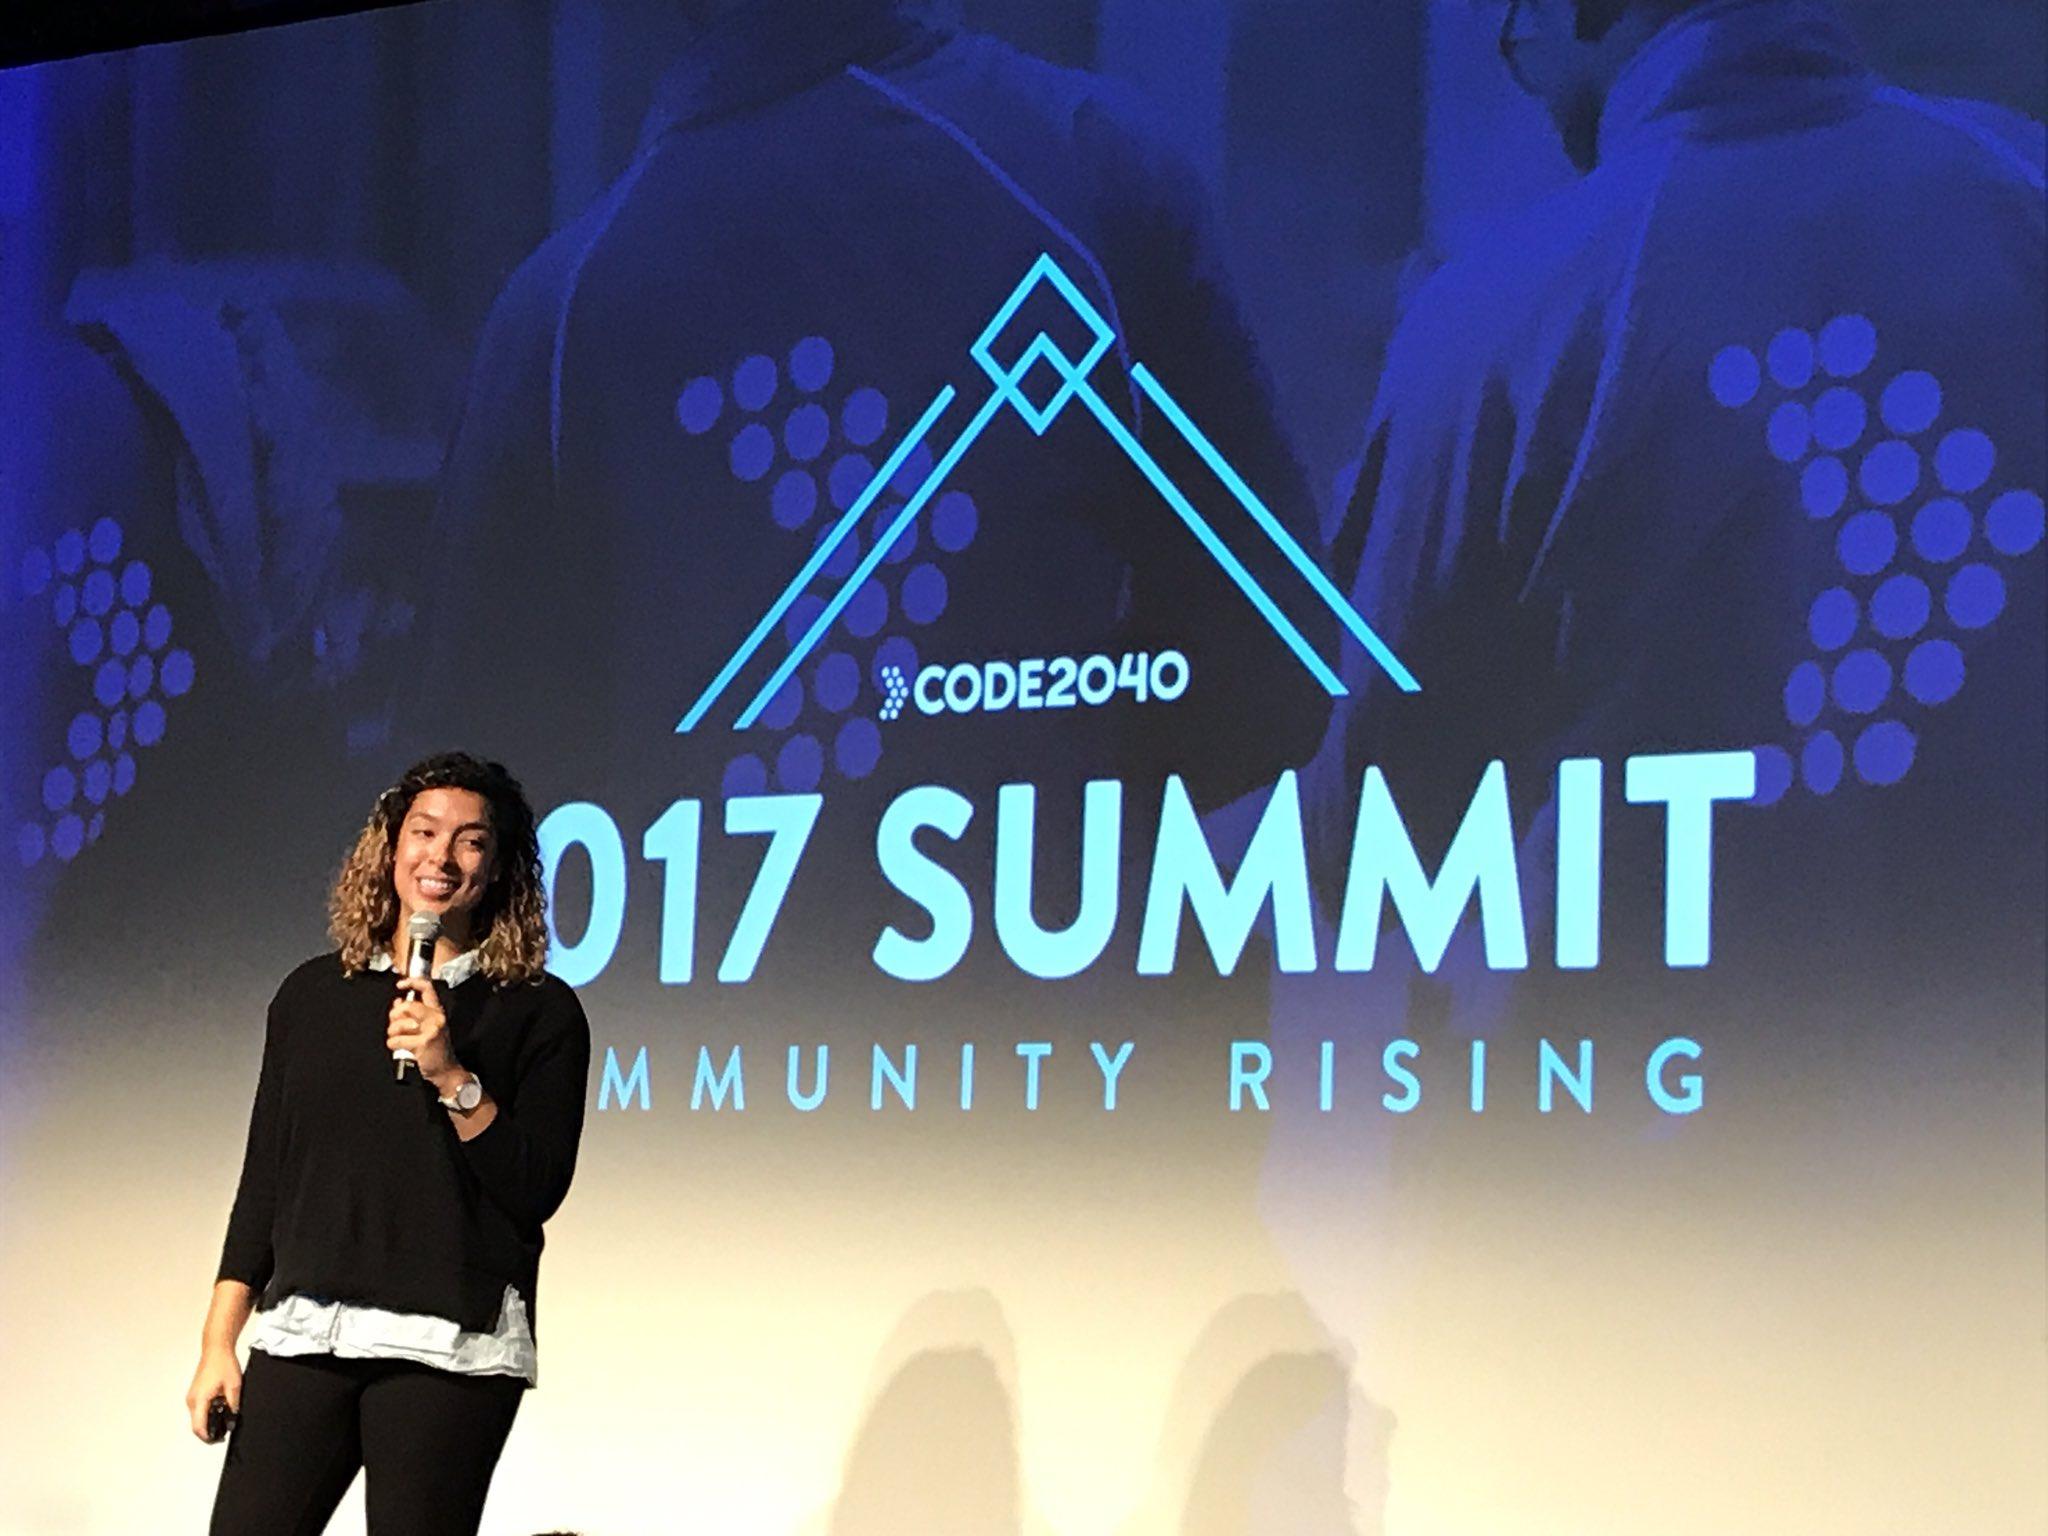 Thumbnail for #Summit2040 2017